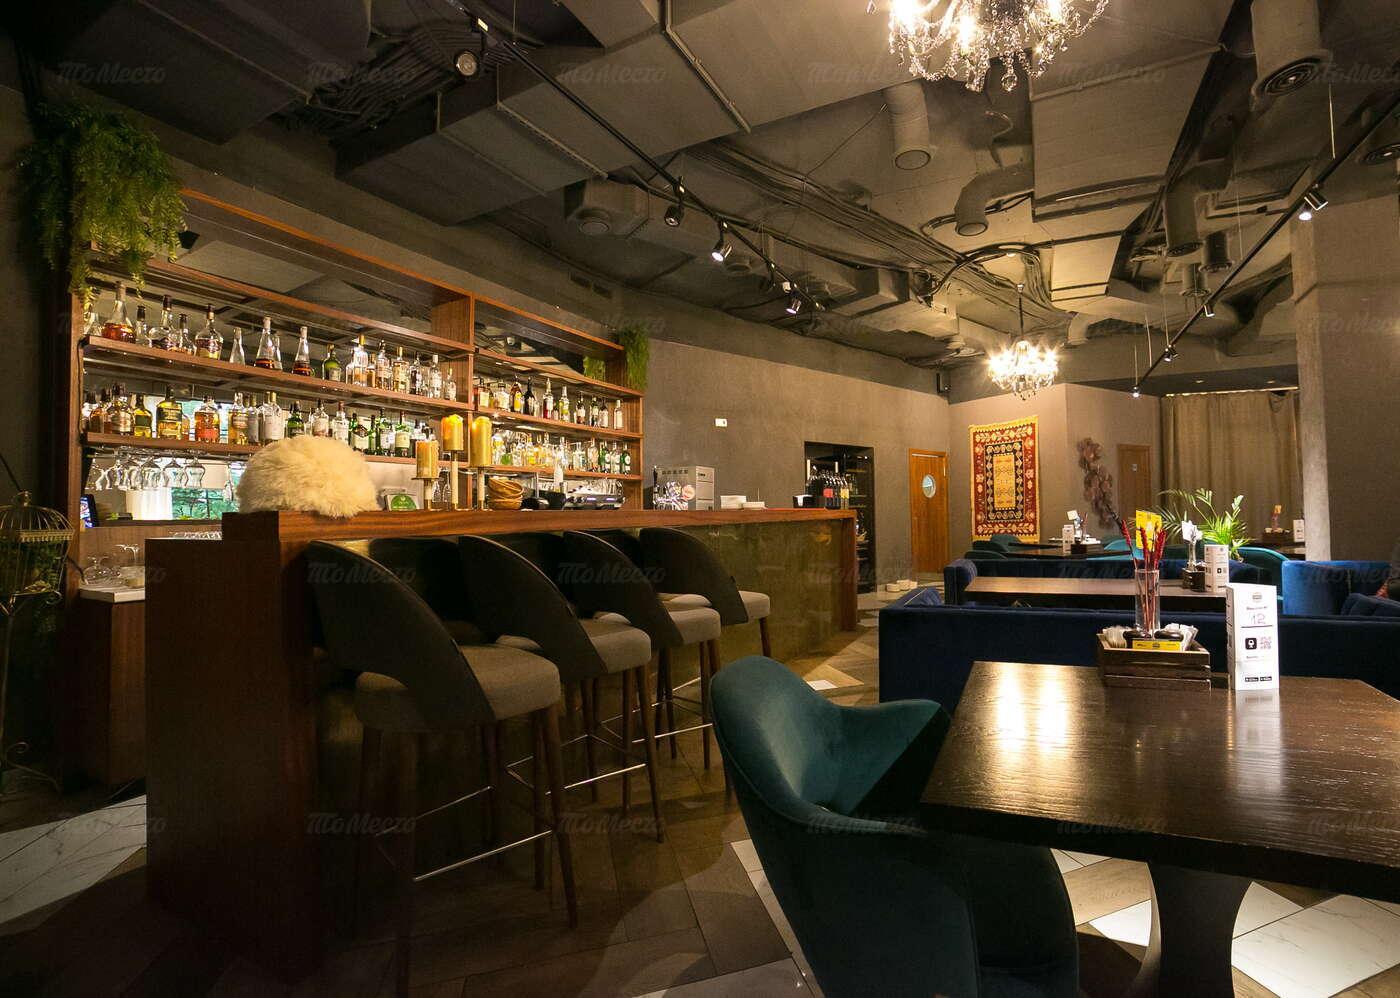 Ресторан Nino (Нино) на Доброслободской фото 3